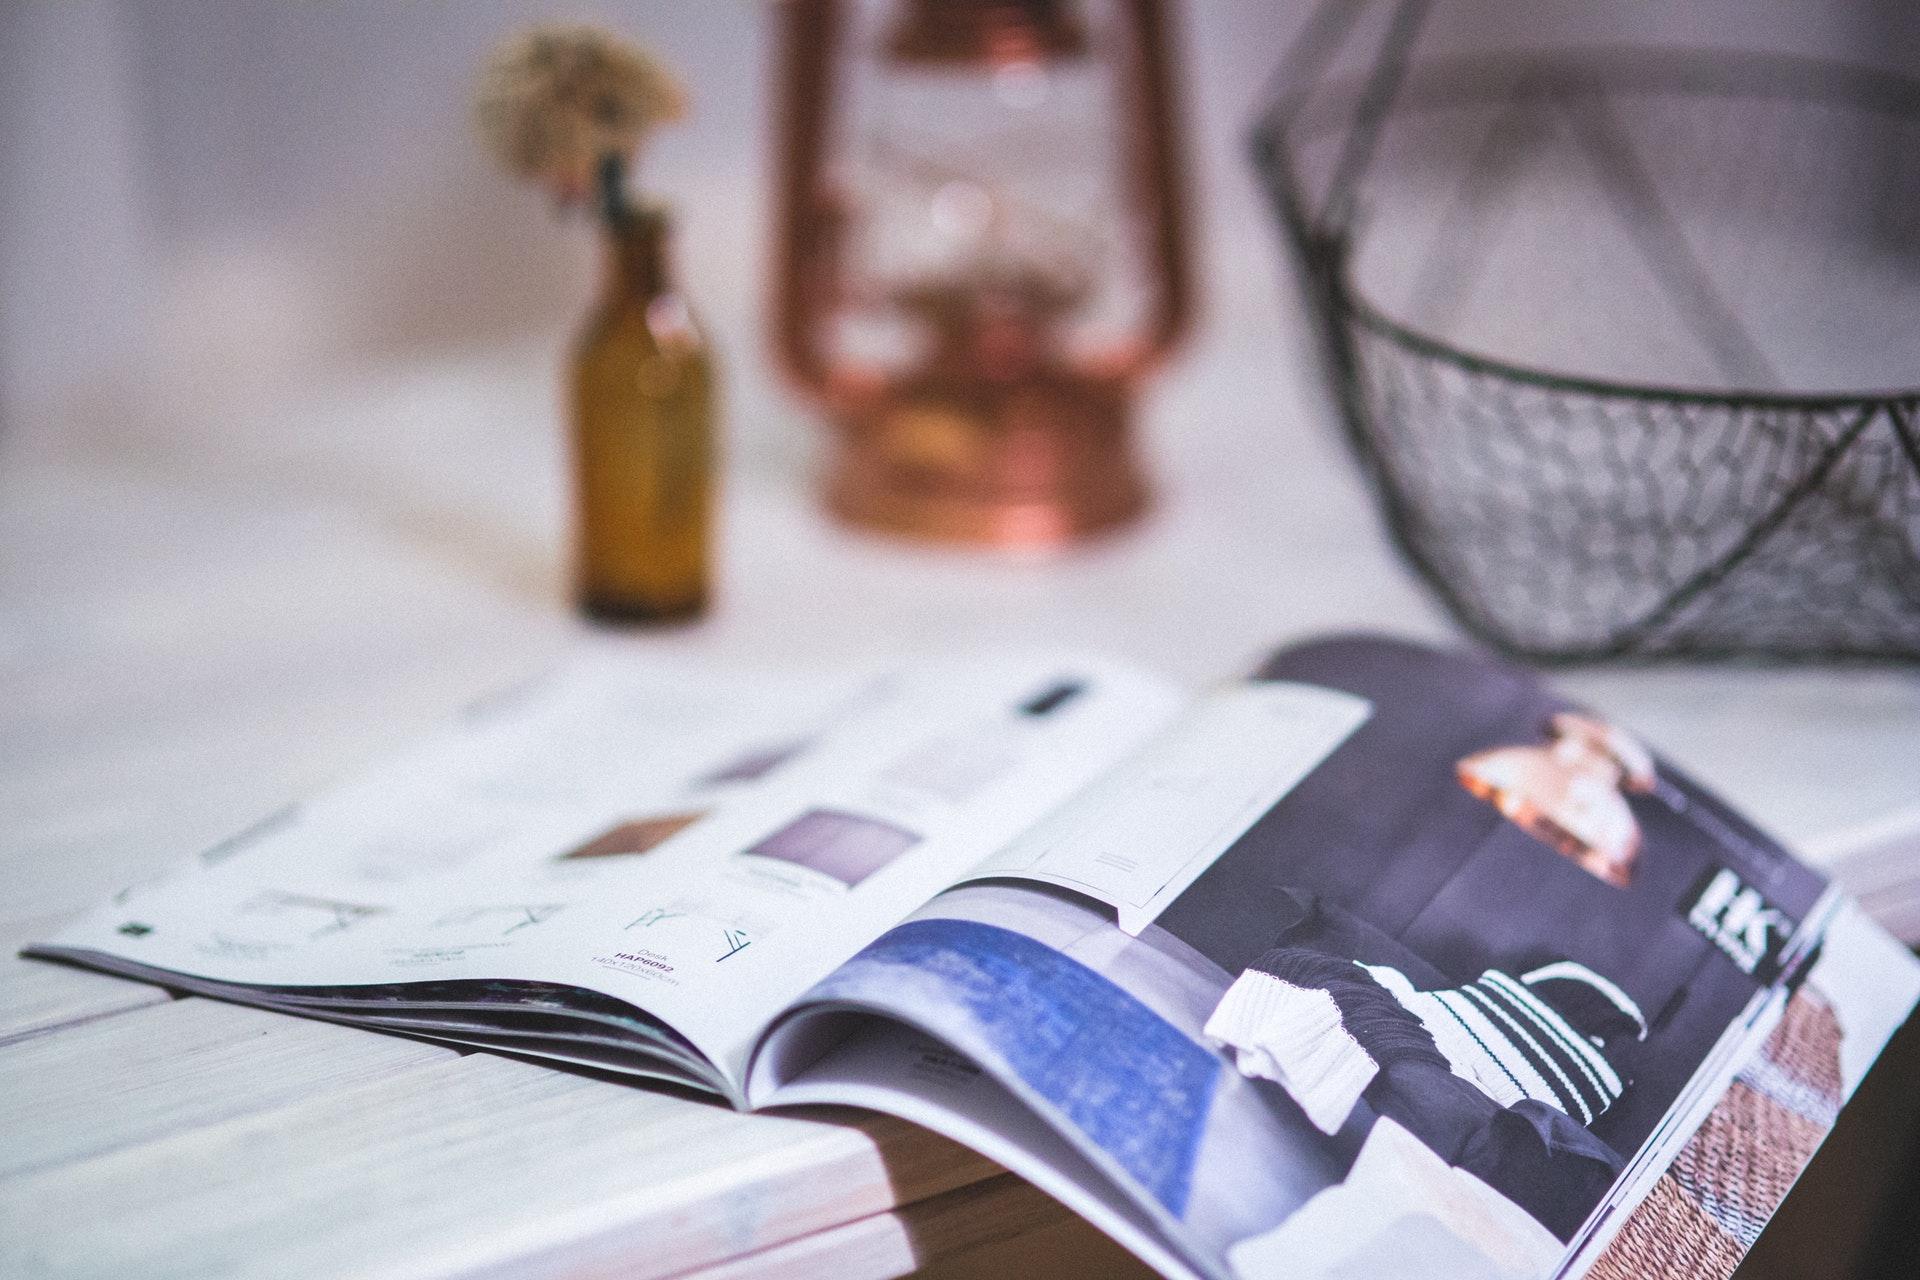 https://mobililionetto.it/wp-content/uploads/2017/10/reading-magazine-open-newspaper-1.jpg